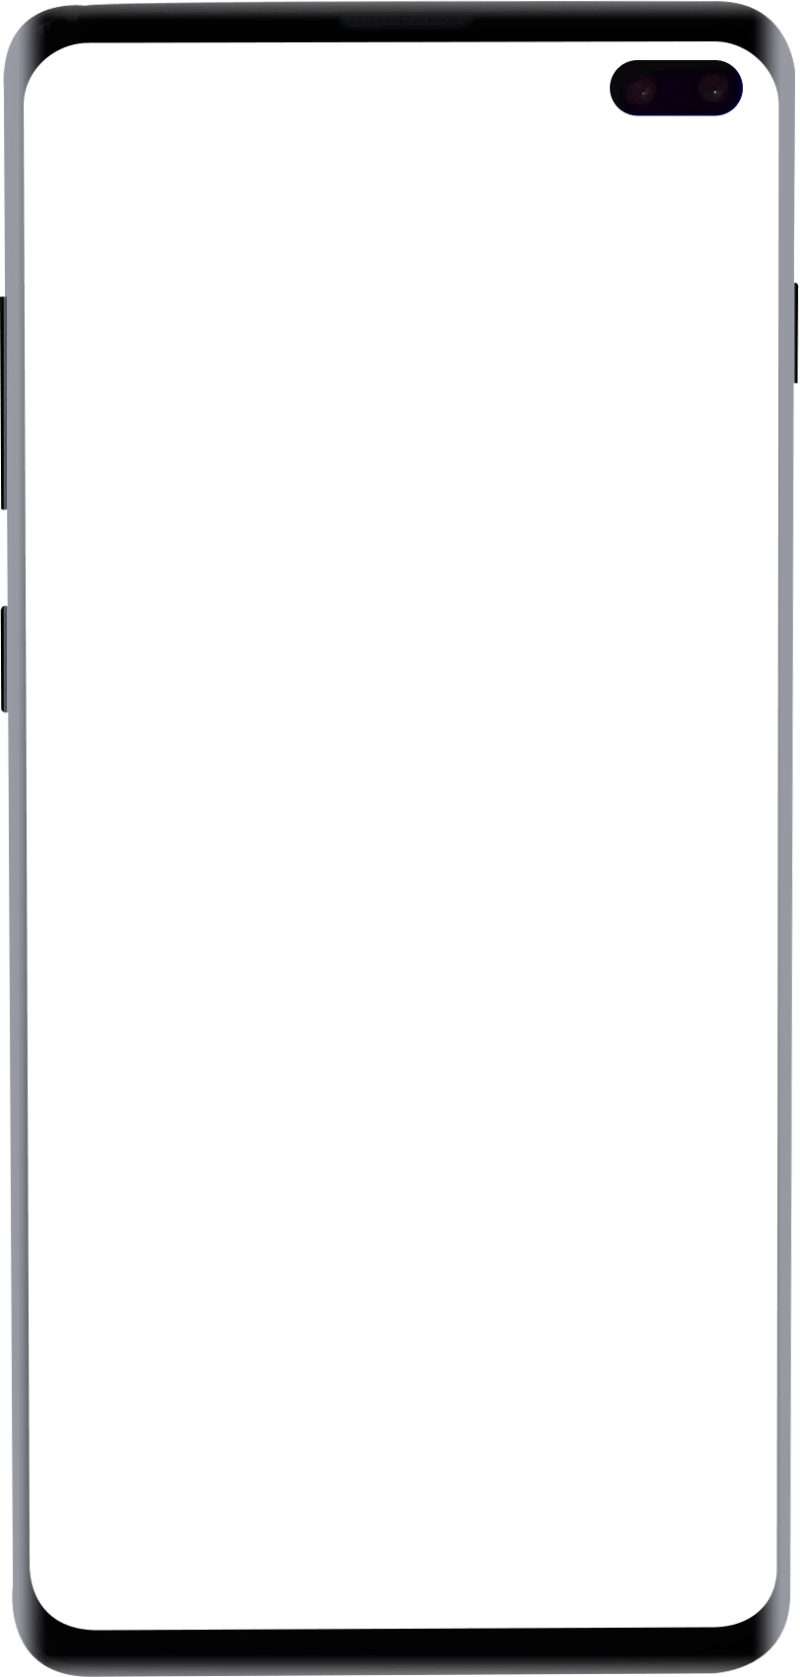 mobile, mobile mockup, mockup, samsung mobile mockup, Samsung, samsung galaxy mobile, samsung galaxy s10, samsung galaxy s10plus, samsung galaxy s10+, s10+, s10, galaxy s10, galaxy s10+, samsung mobile mockup, tiles